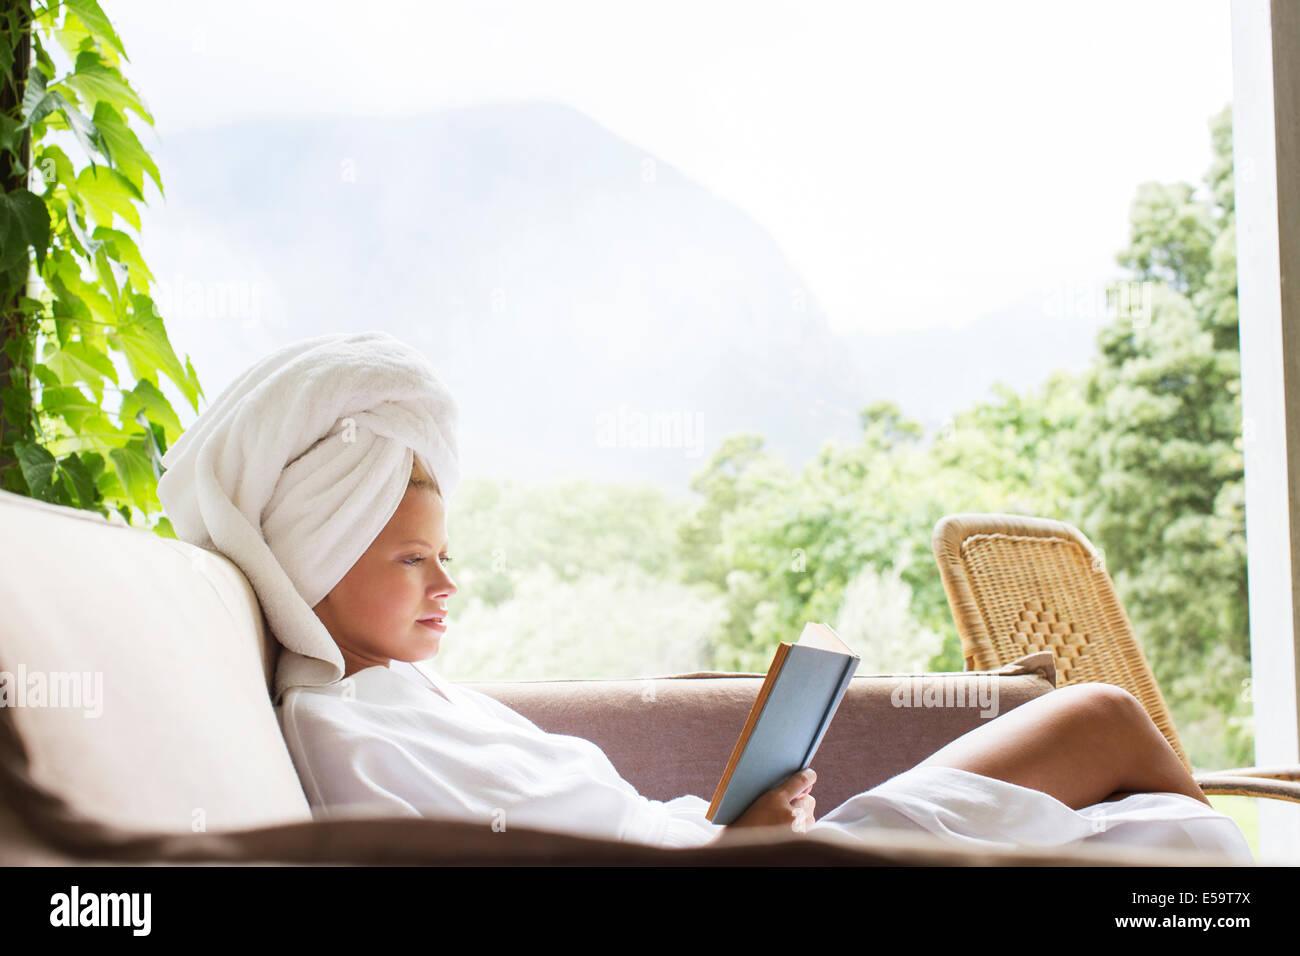 Woman in bathrobe reading on sofa - Stock Image